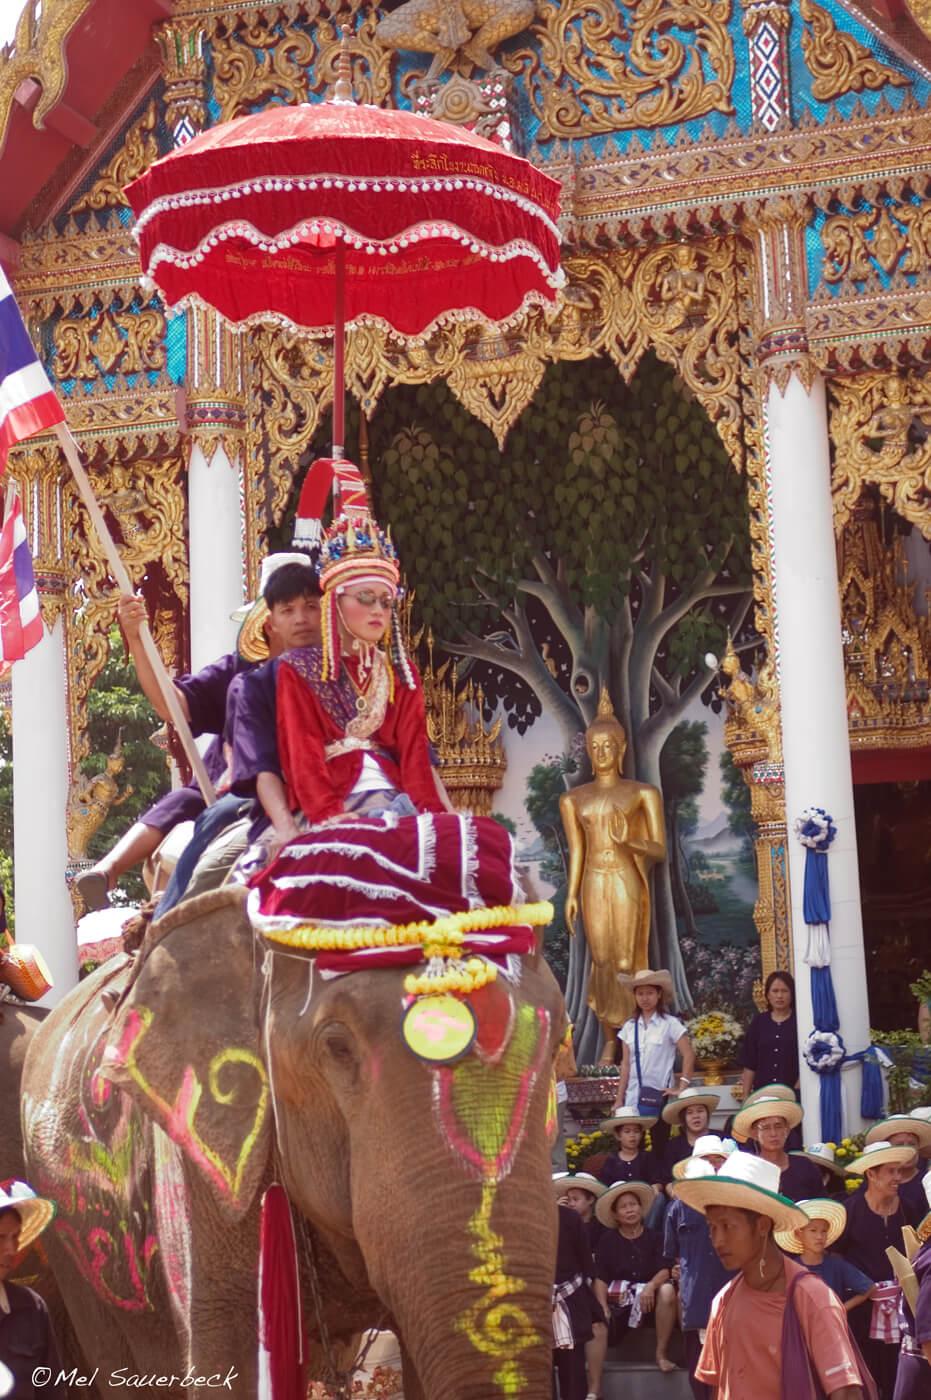 Boy on elephant at temple, Thailand